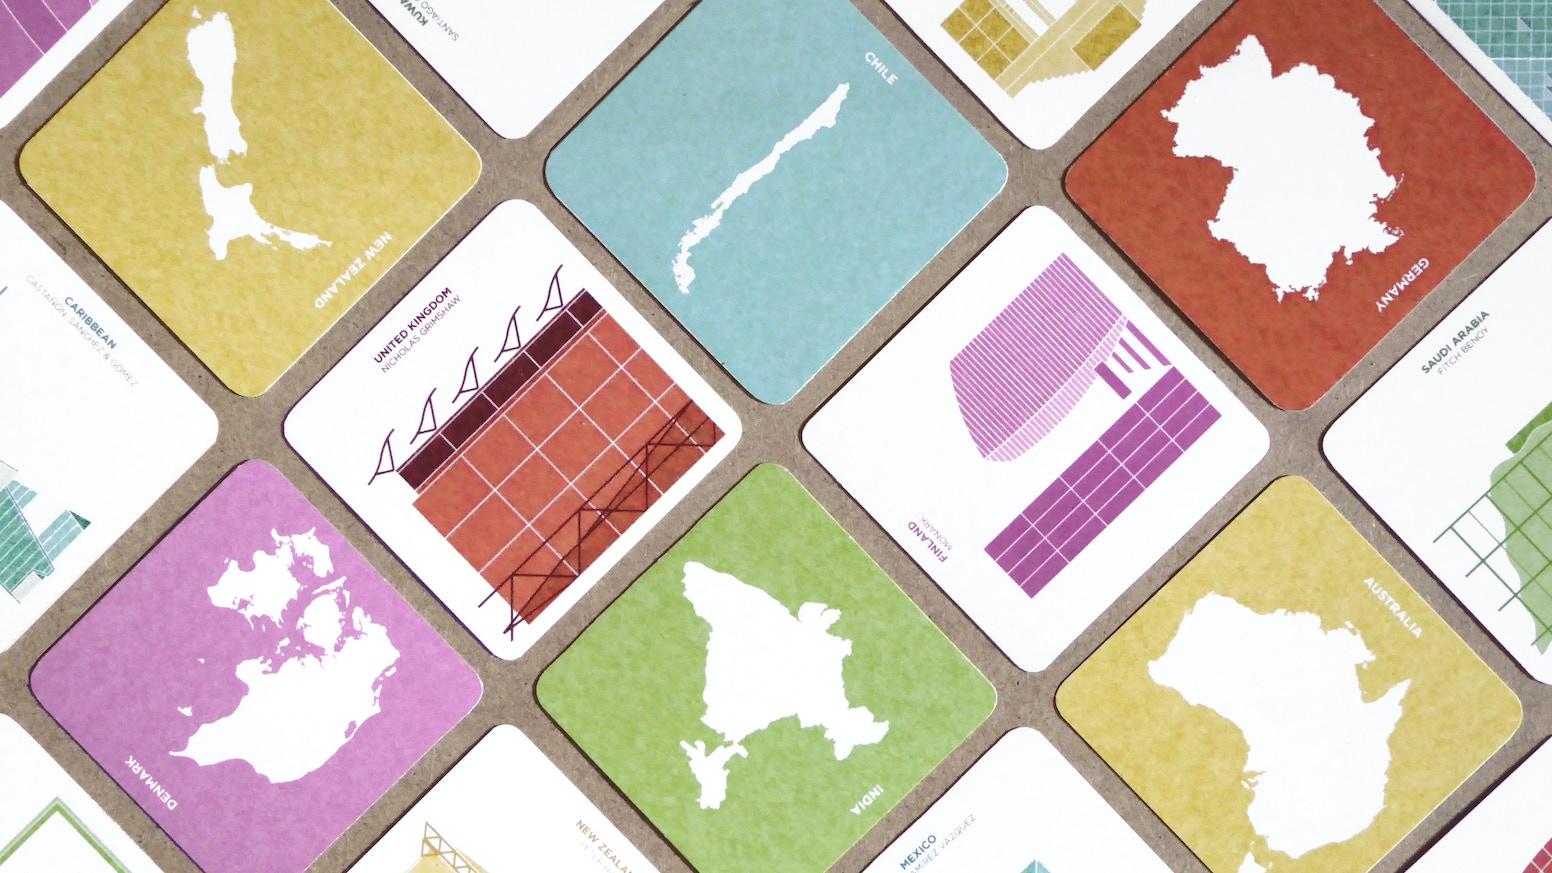 EXPO Architecture Memory Game By Arquitectura A Contrapelo - Game architecture and design